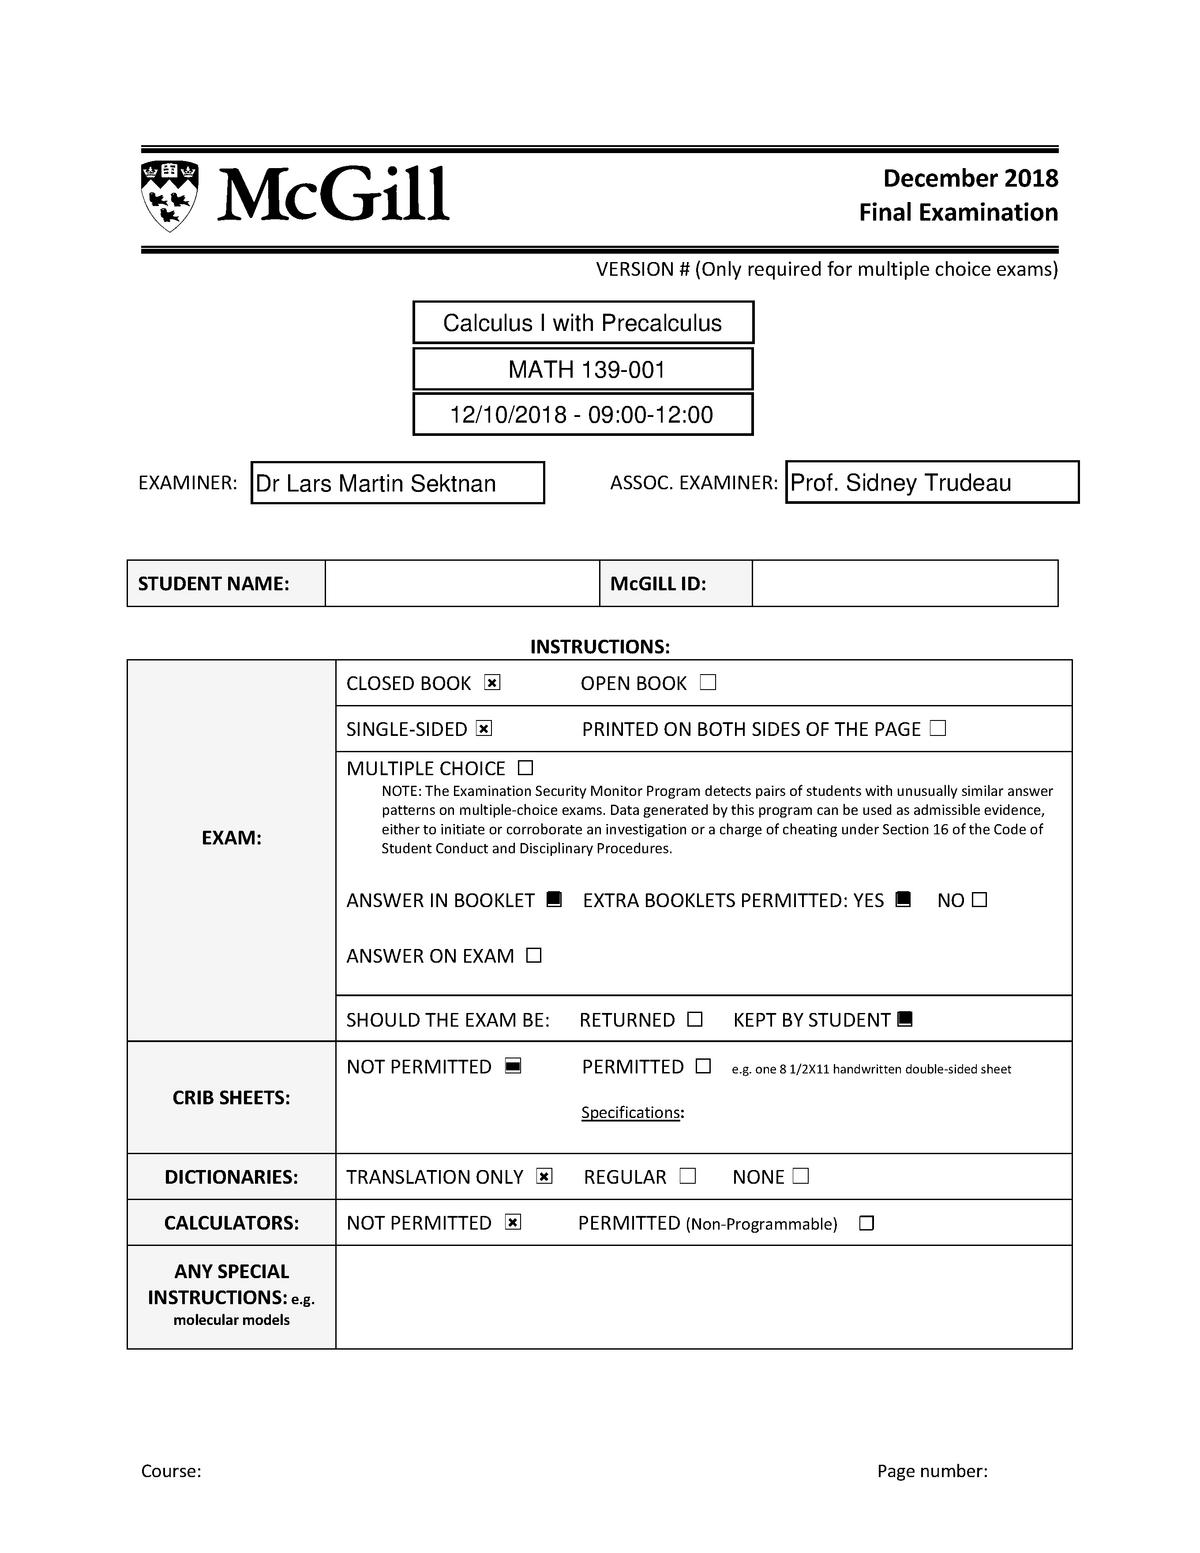 Precalculus Semester 2 Exam Multiple Choice